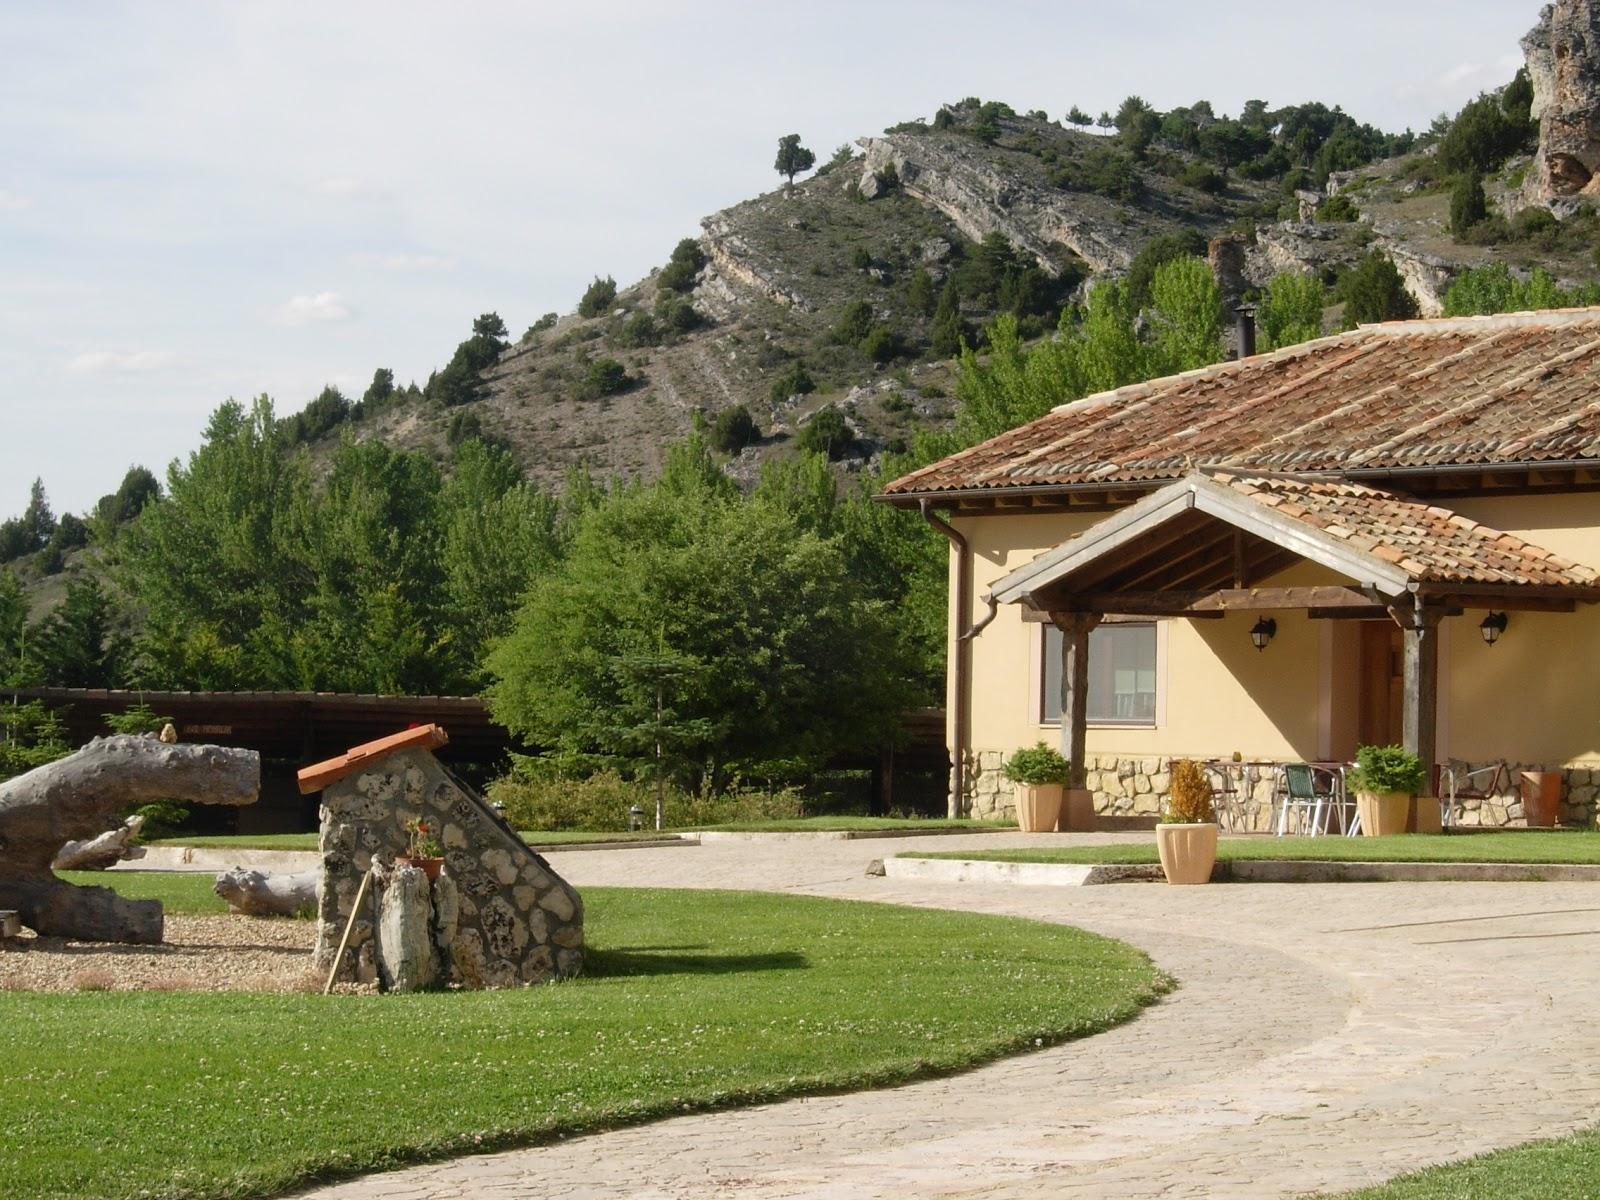 Estancias rurales charming hotels hotel de la semana for Charming hotels